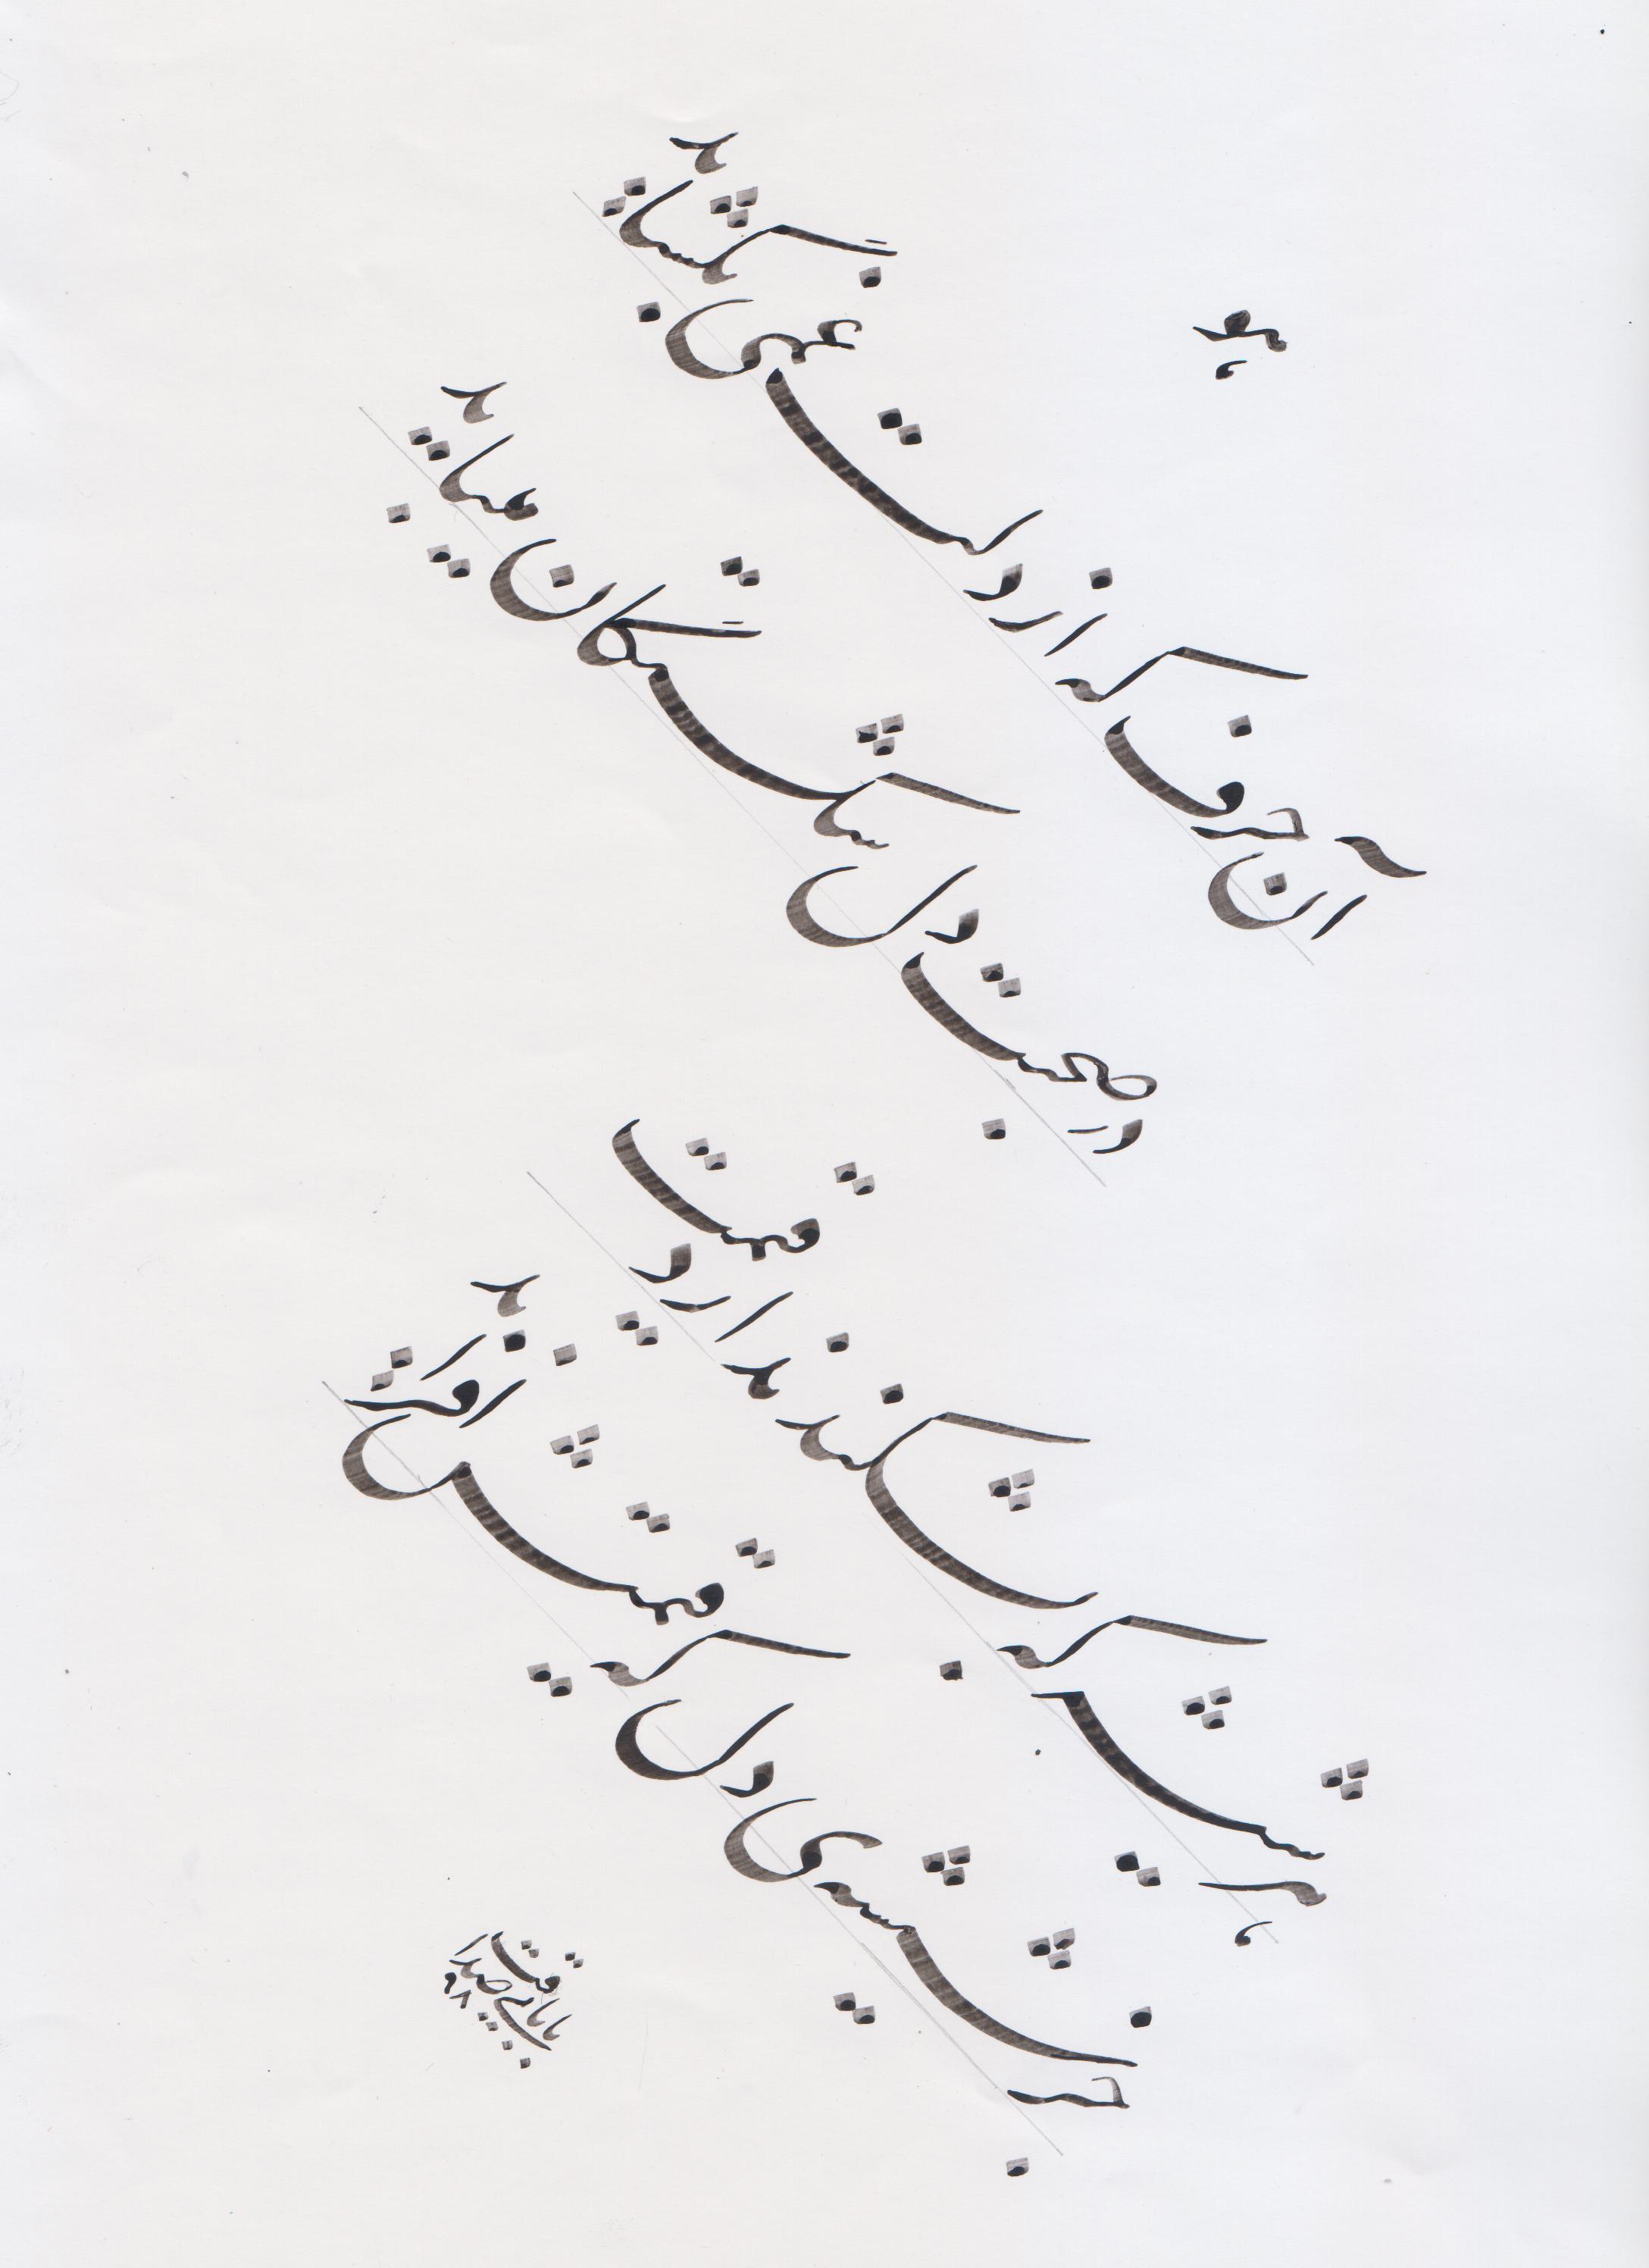 pm1e_جناب_آقای_بابایی_صداقت_f_001.jpg